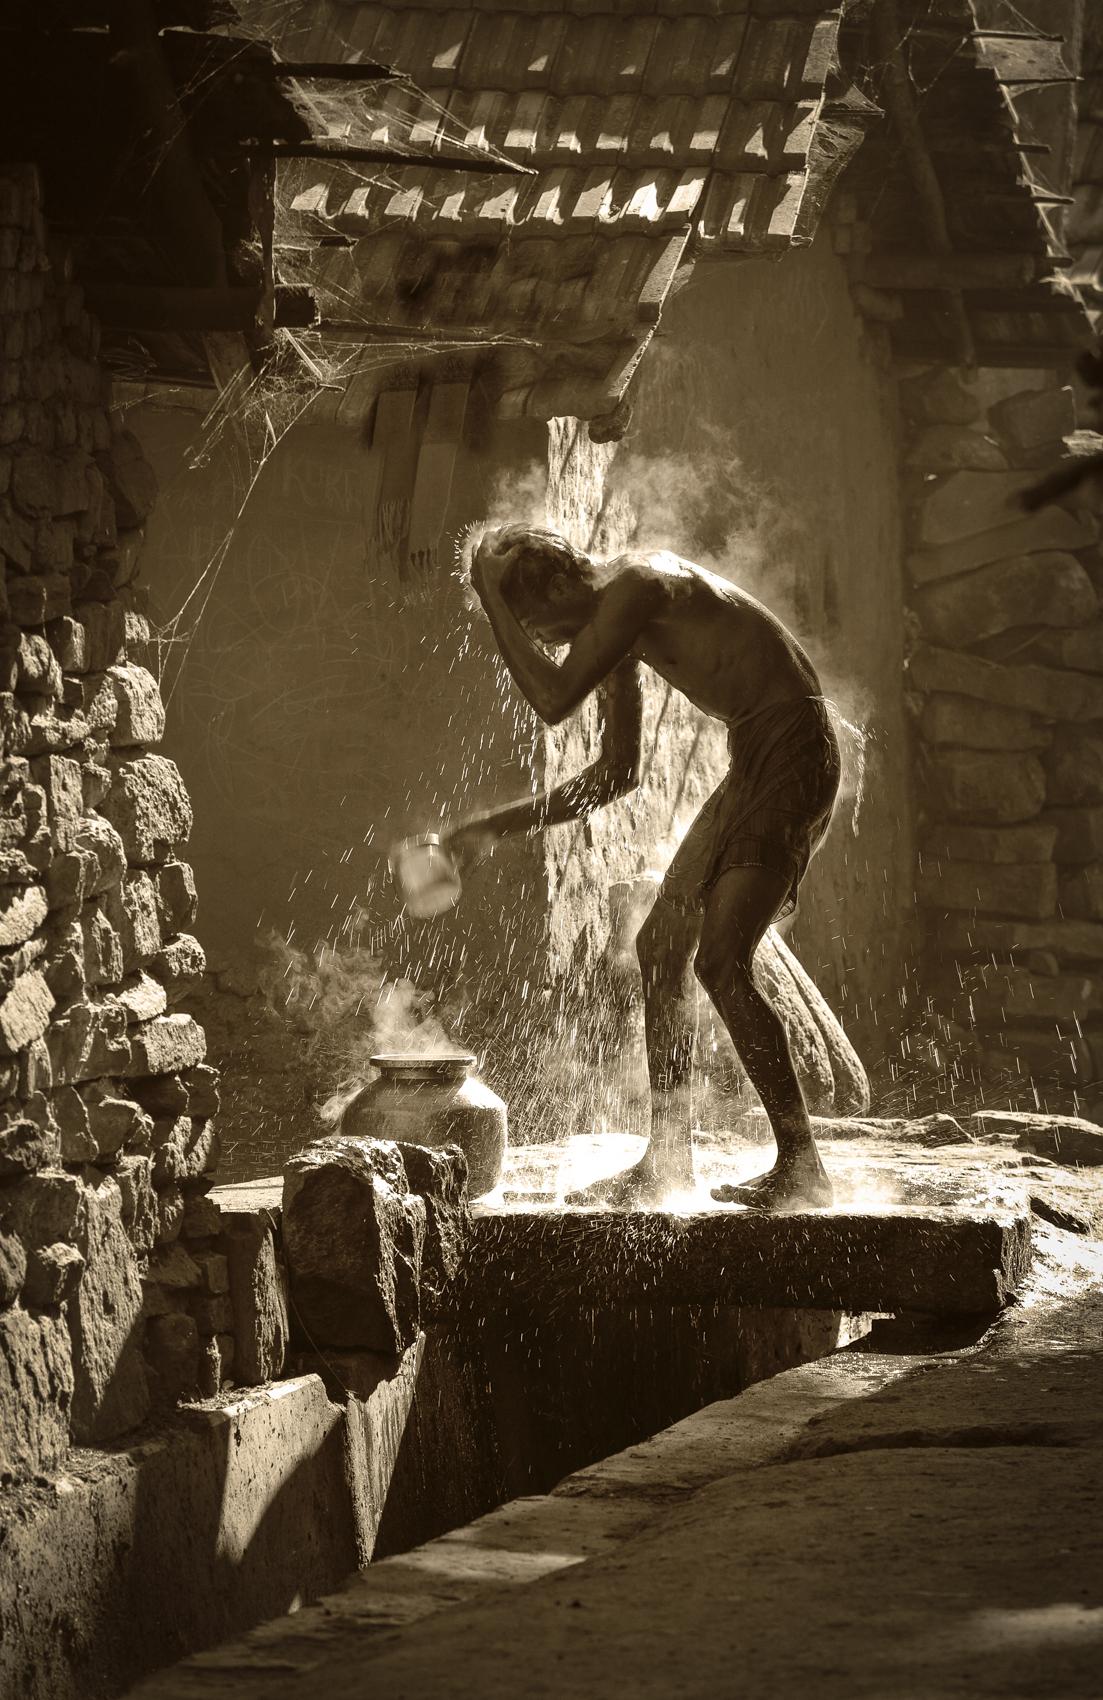 Morning bath, India